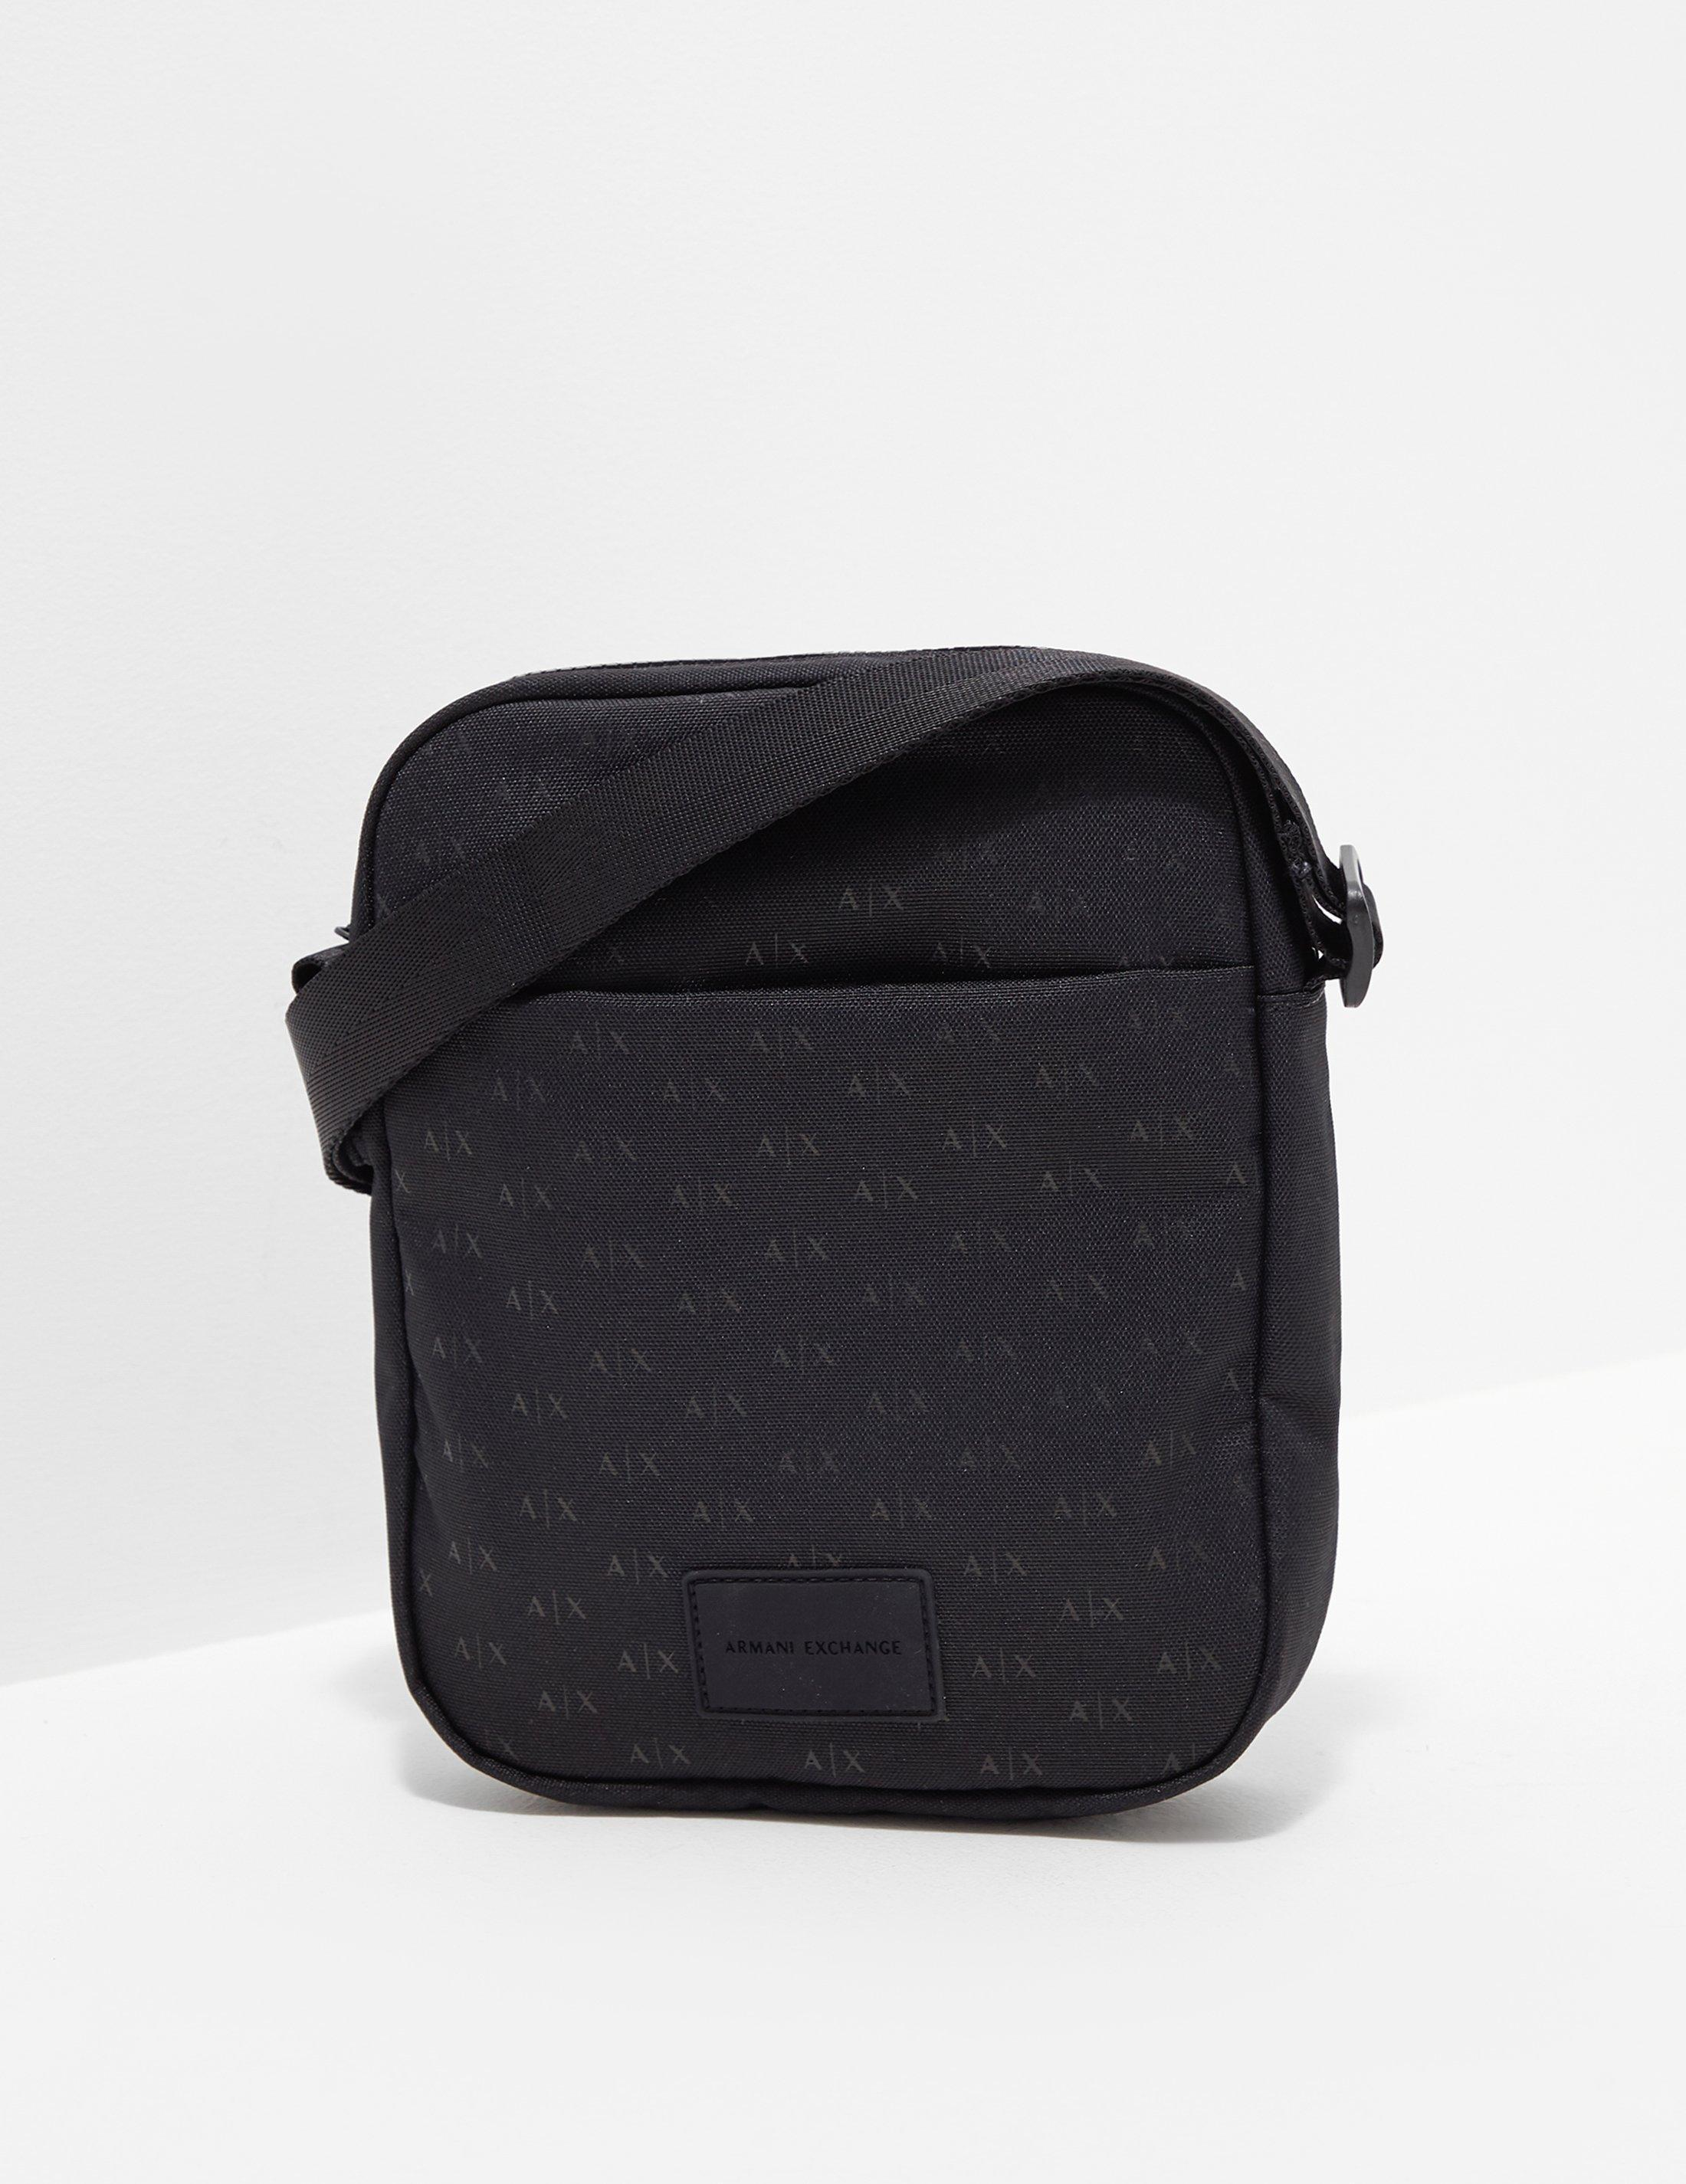 07e7e71479fa Armani Exchange - Mens All Over Print Small Item Bag Black for Men - Lyst.  View fullscreen